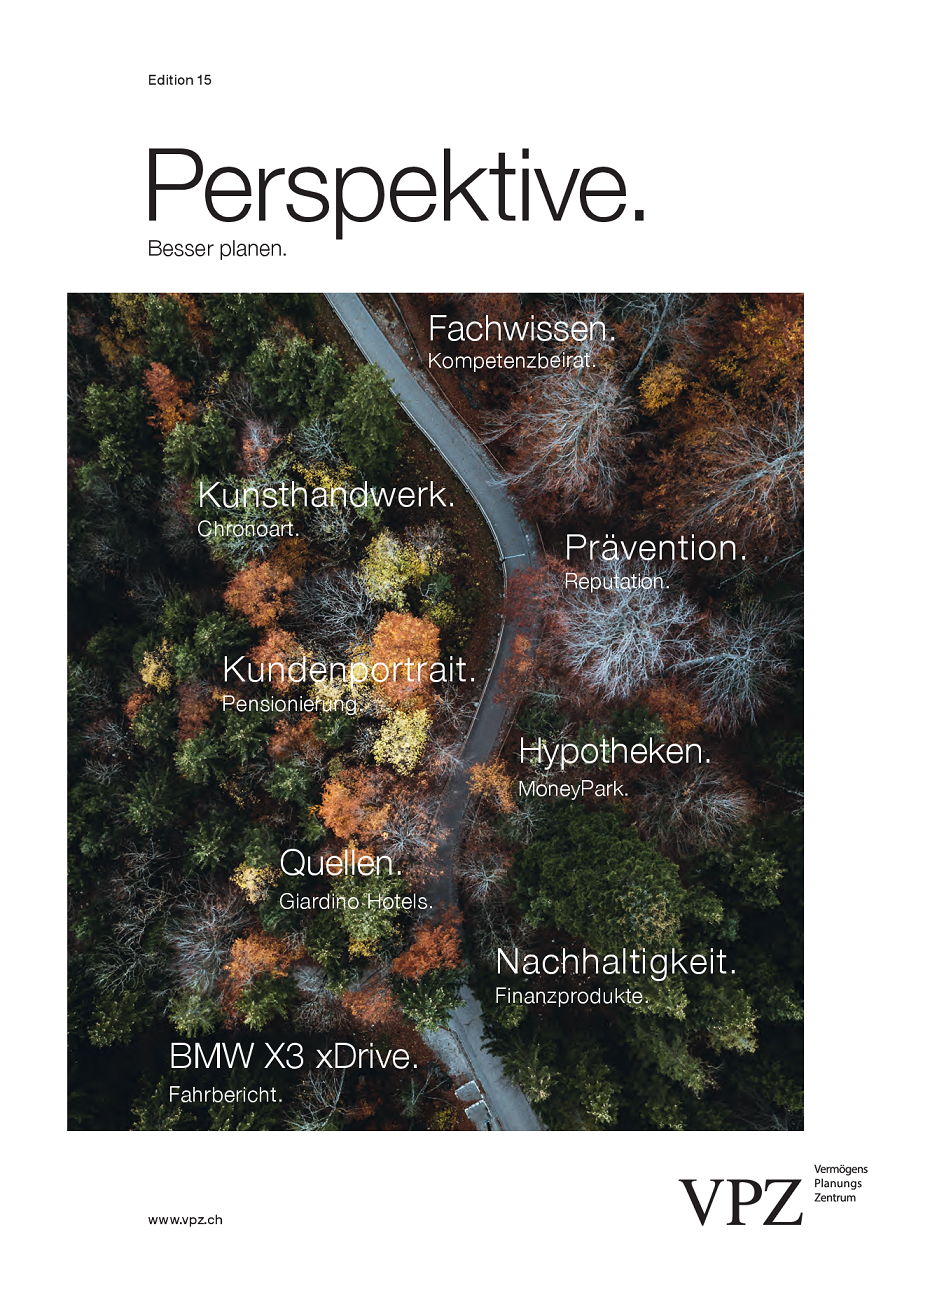 VPZ Kundenmagazin Perspektive. 15